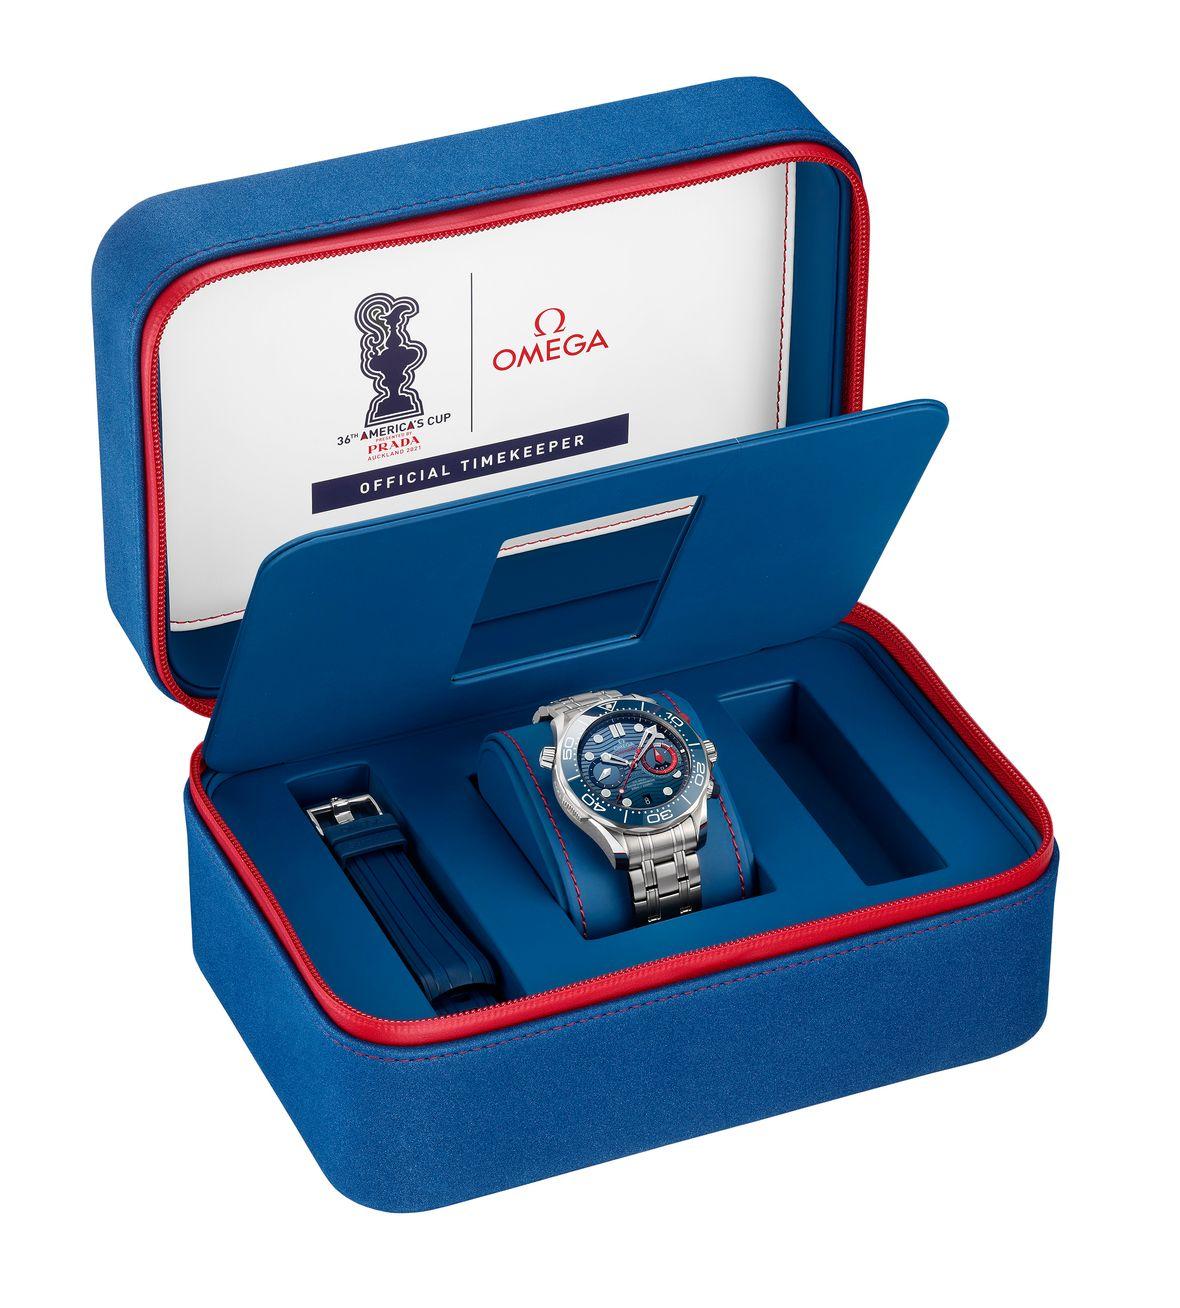 Omega Seamaster Diver 300M Chronograph America's Cup Edition - Presentation Box